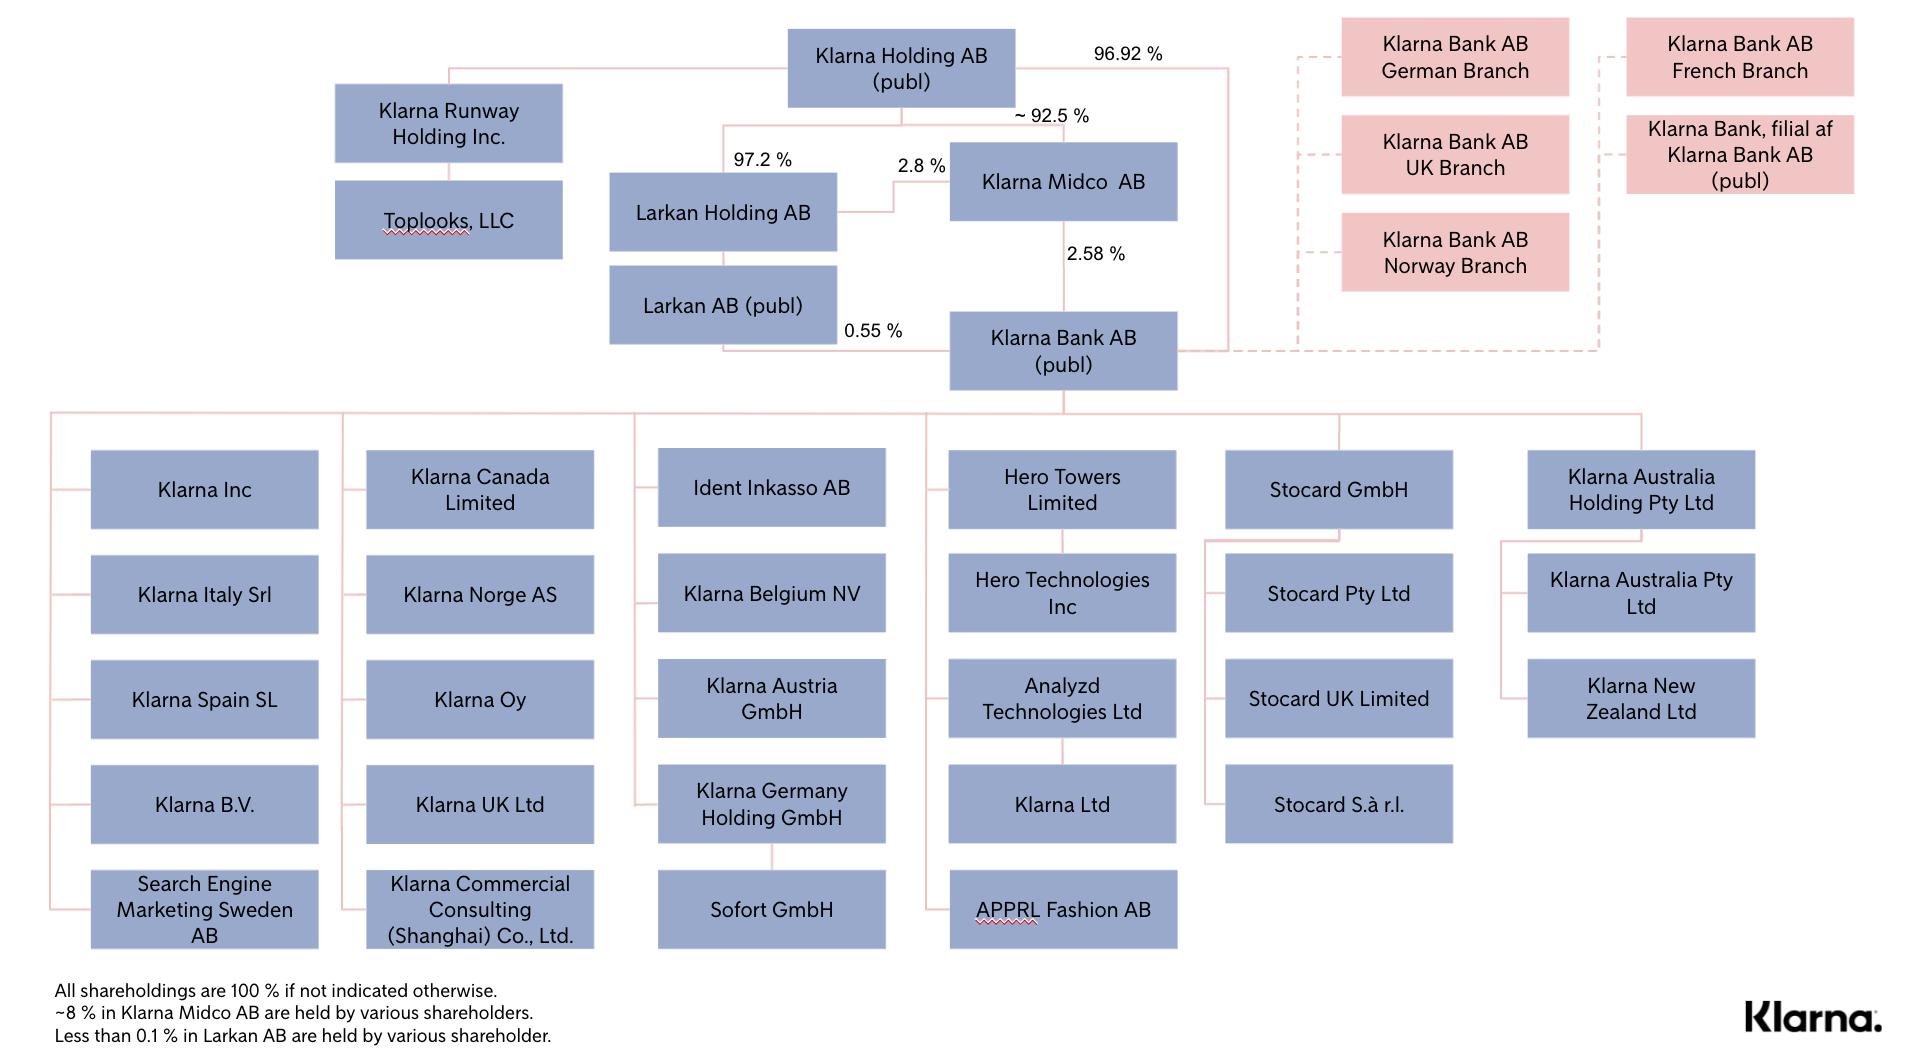 Klarna Legal Entity Chart - August 2021